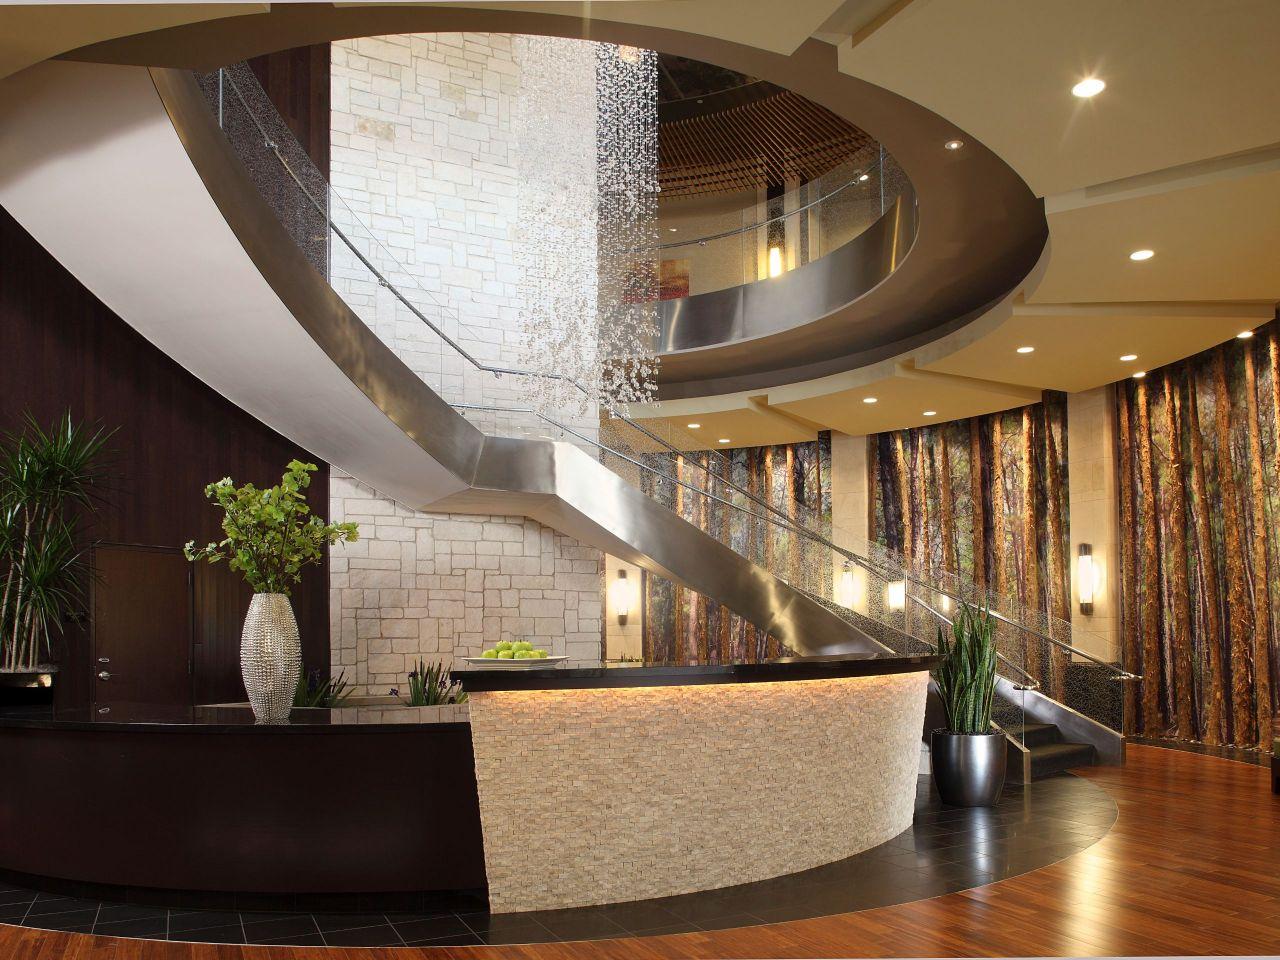 Hyatt Centric The Woodlands | Hotel Front Desk